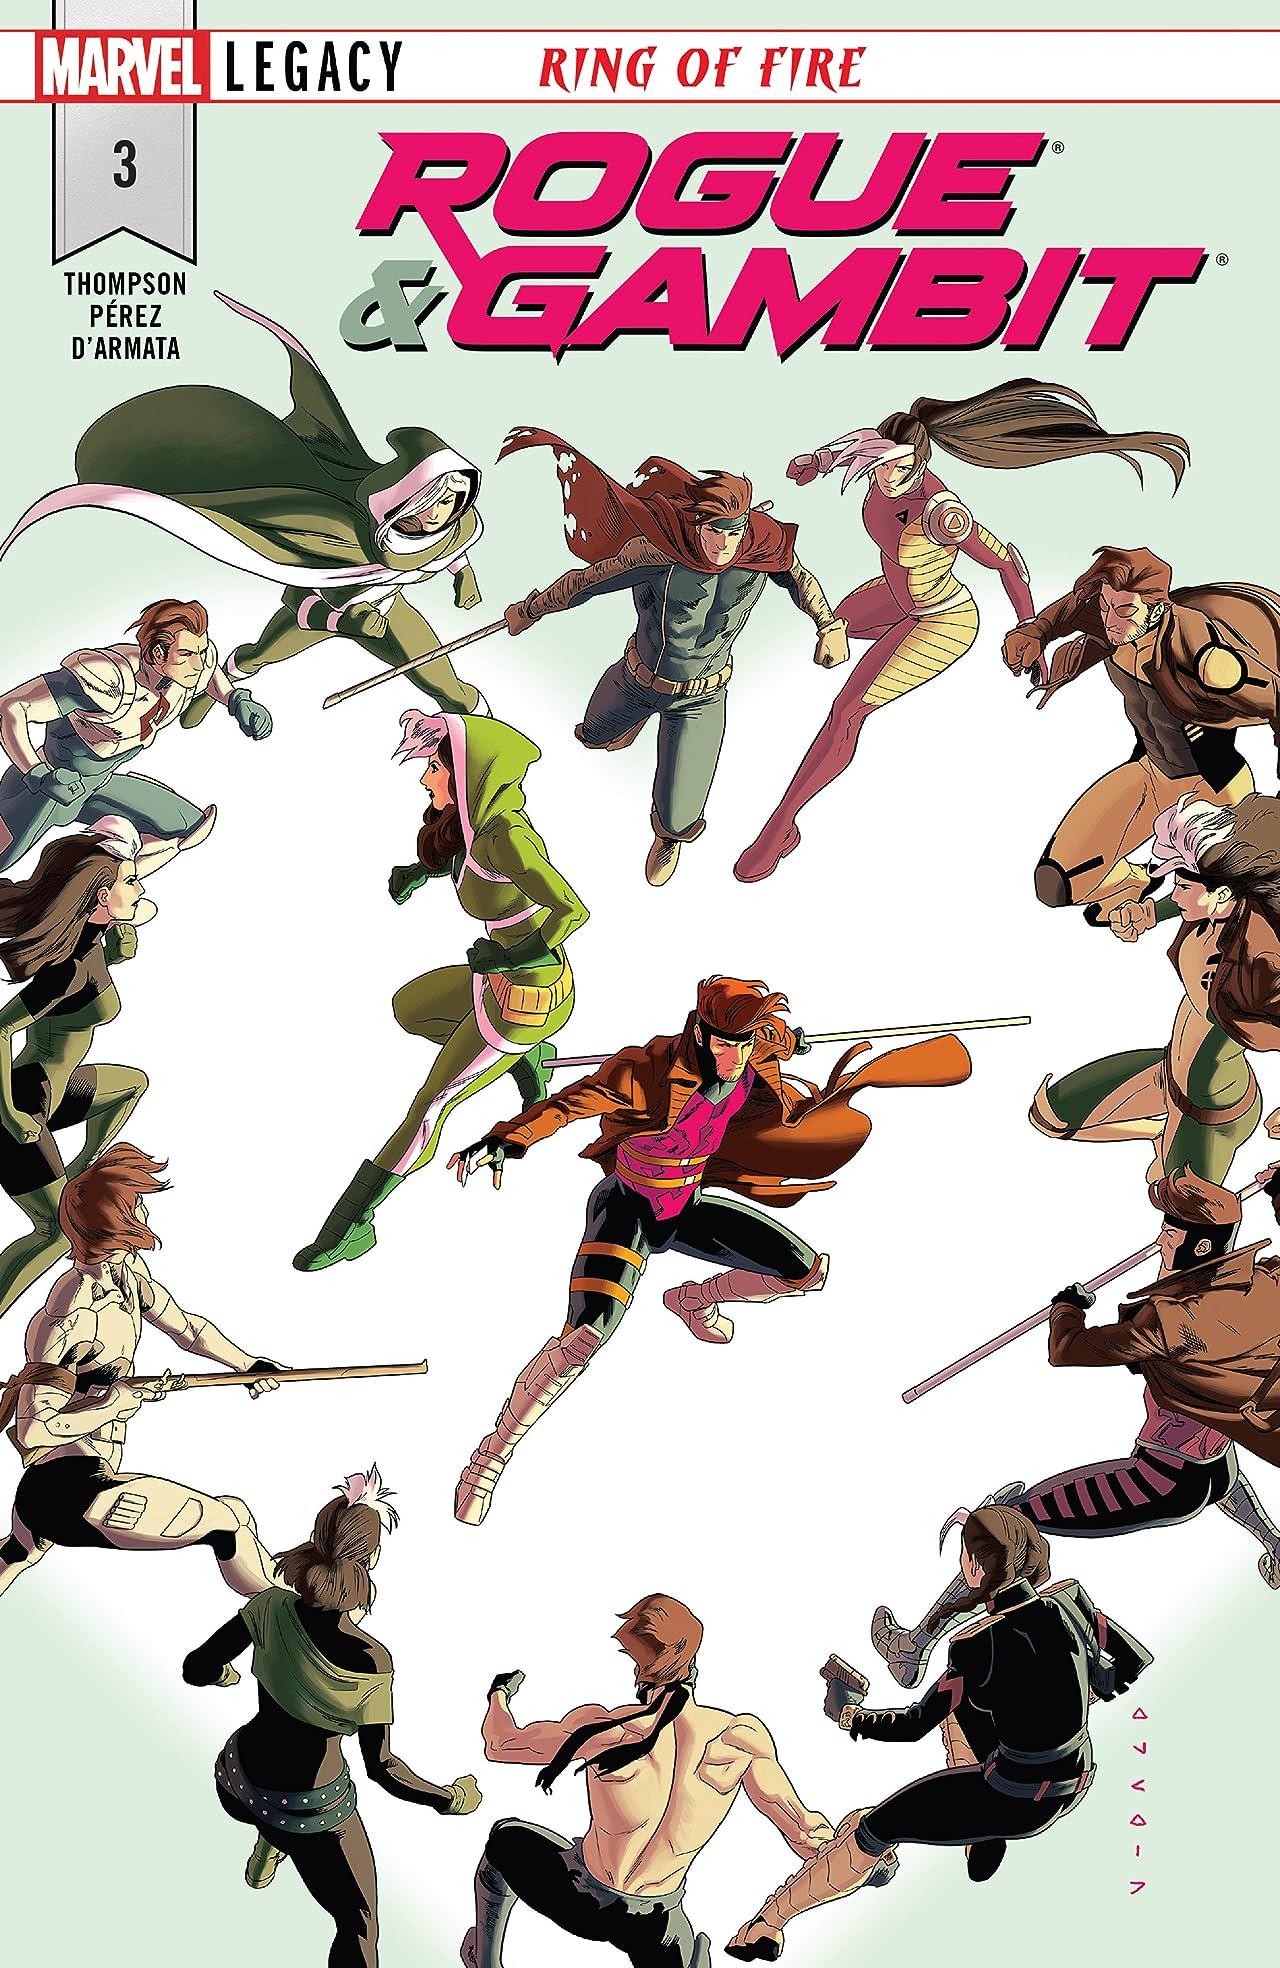 Rogue & Gambit (2018) #3 (of 5)